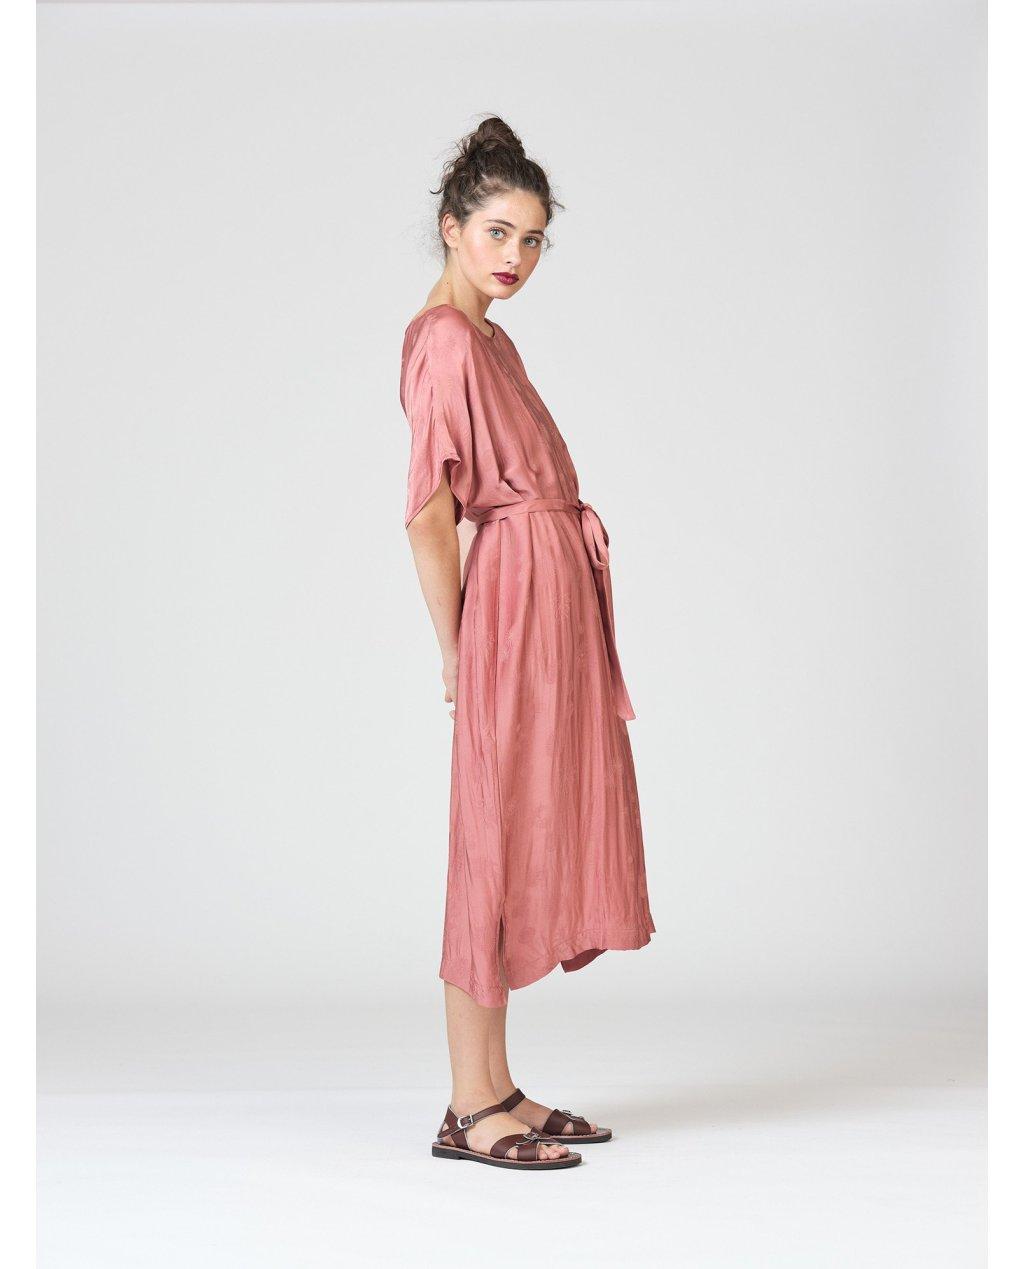 Widdess   Spring 2020   Mitchell Dress   Rosewood   Tencel/Rayon